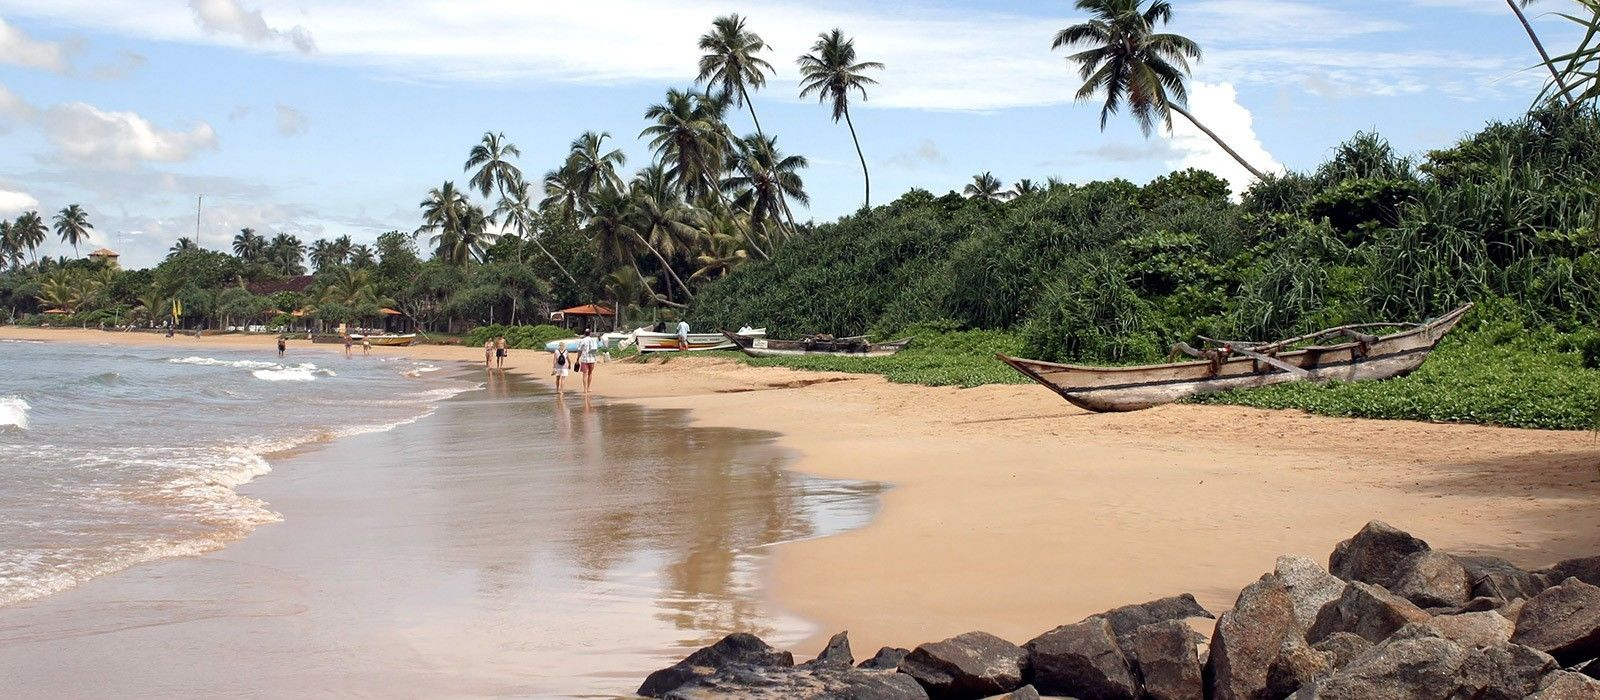 Destination Negombo Sri Lanka